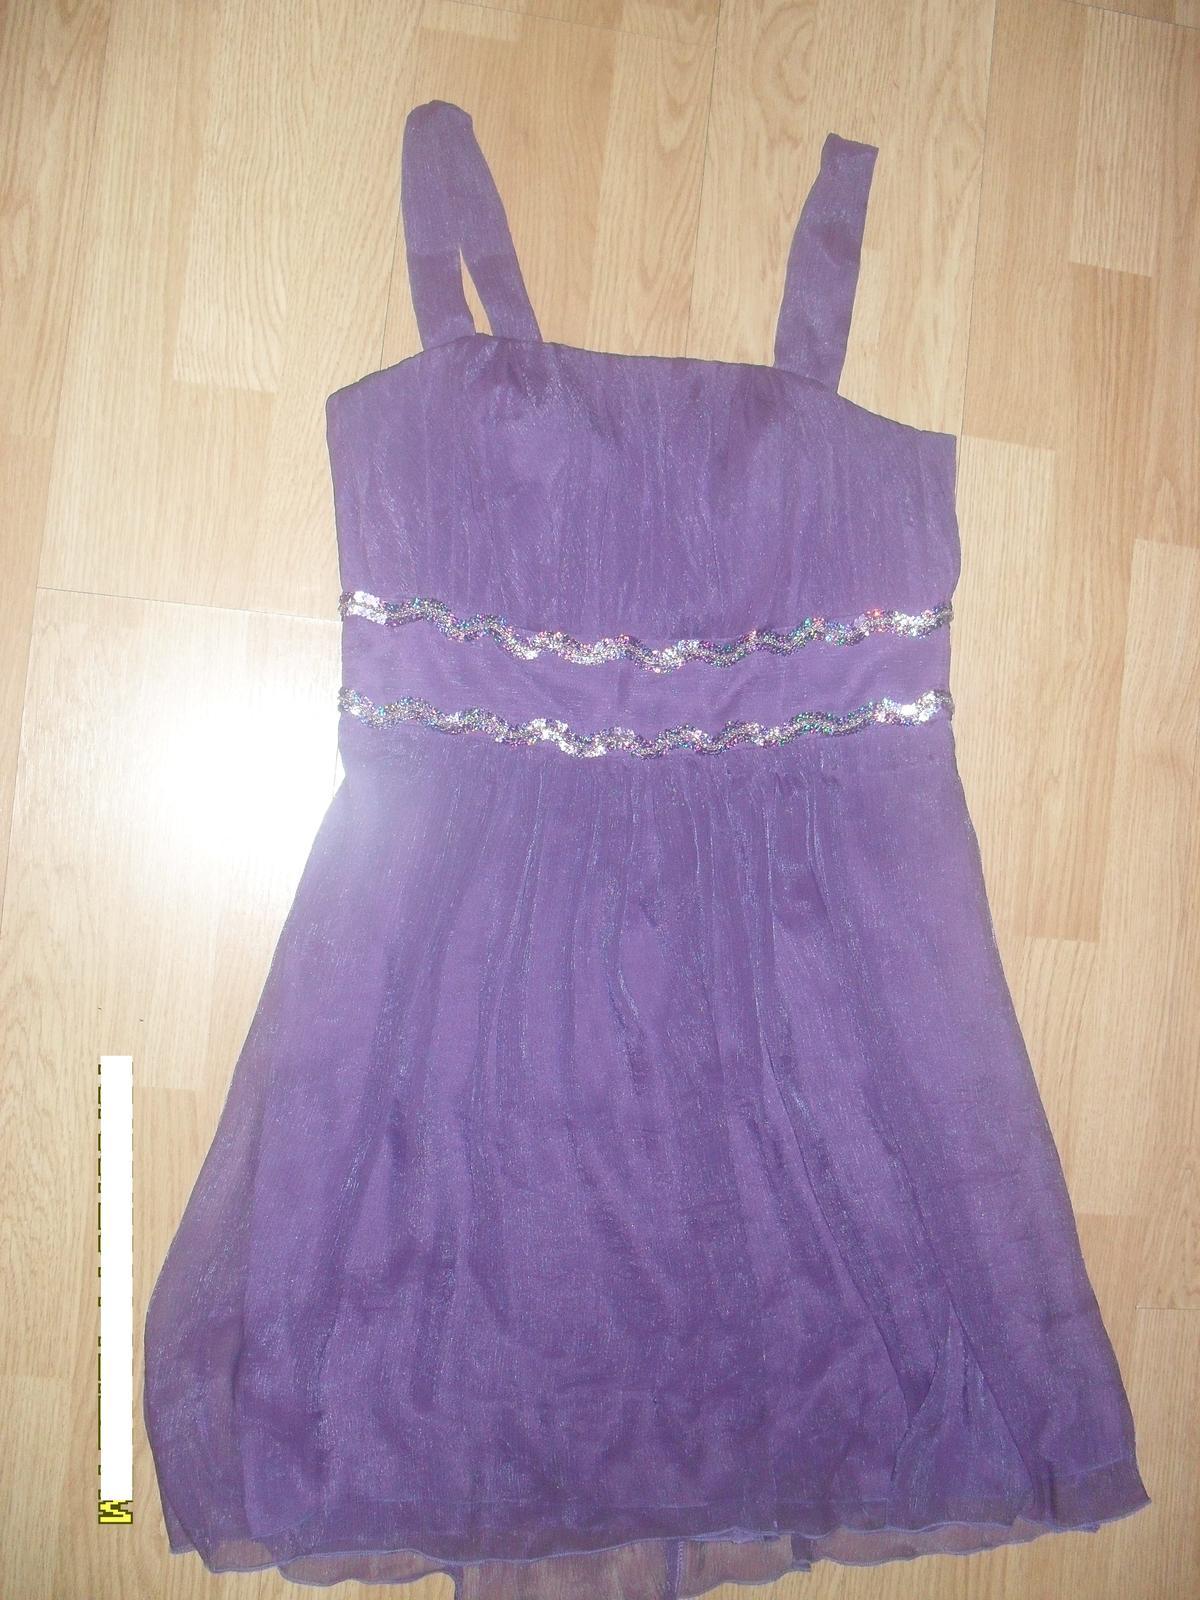 fialové šaty L-XL - Obrázok č. 3